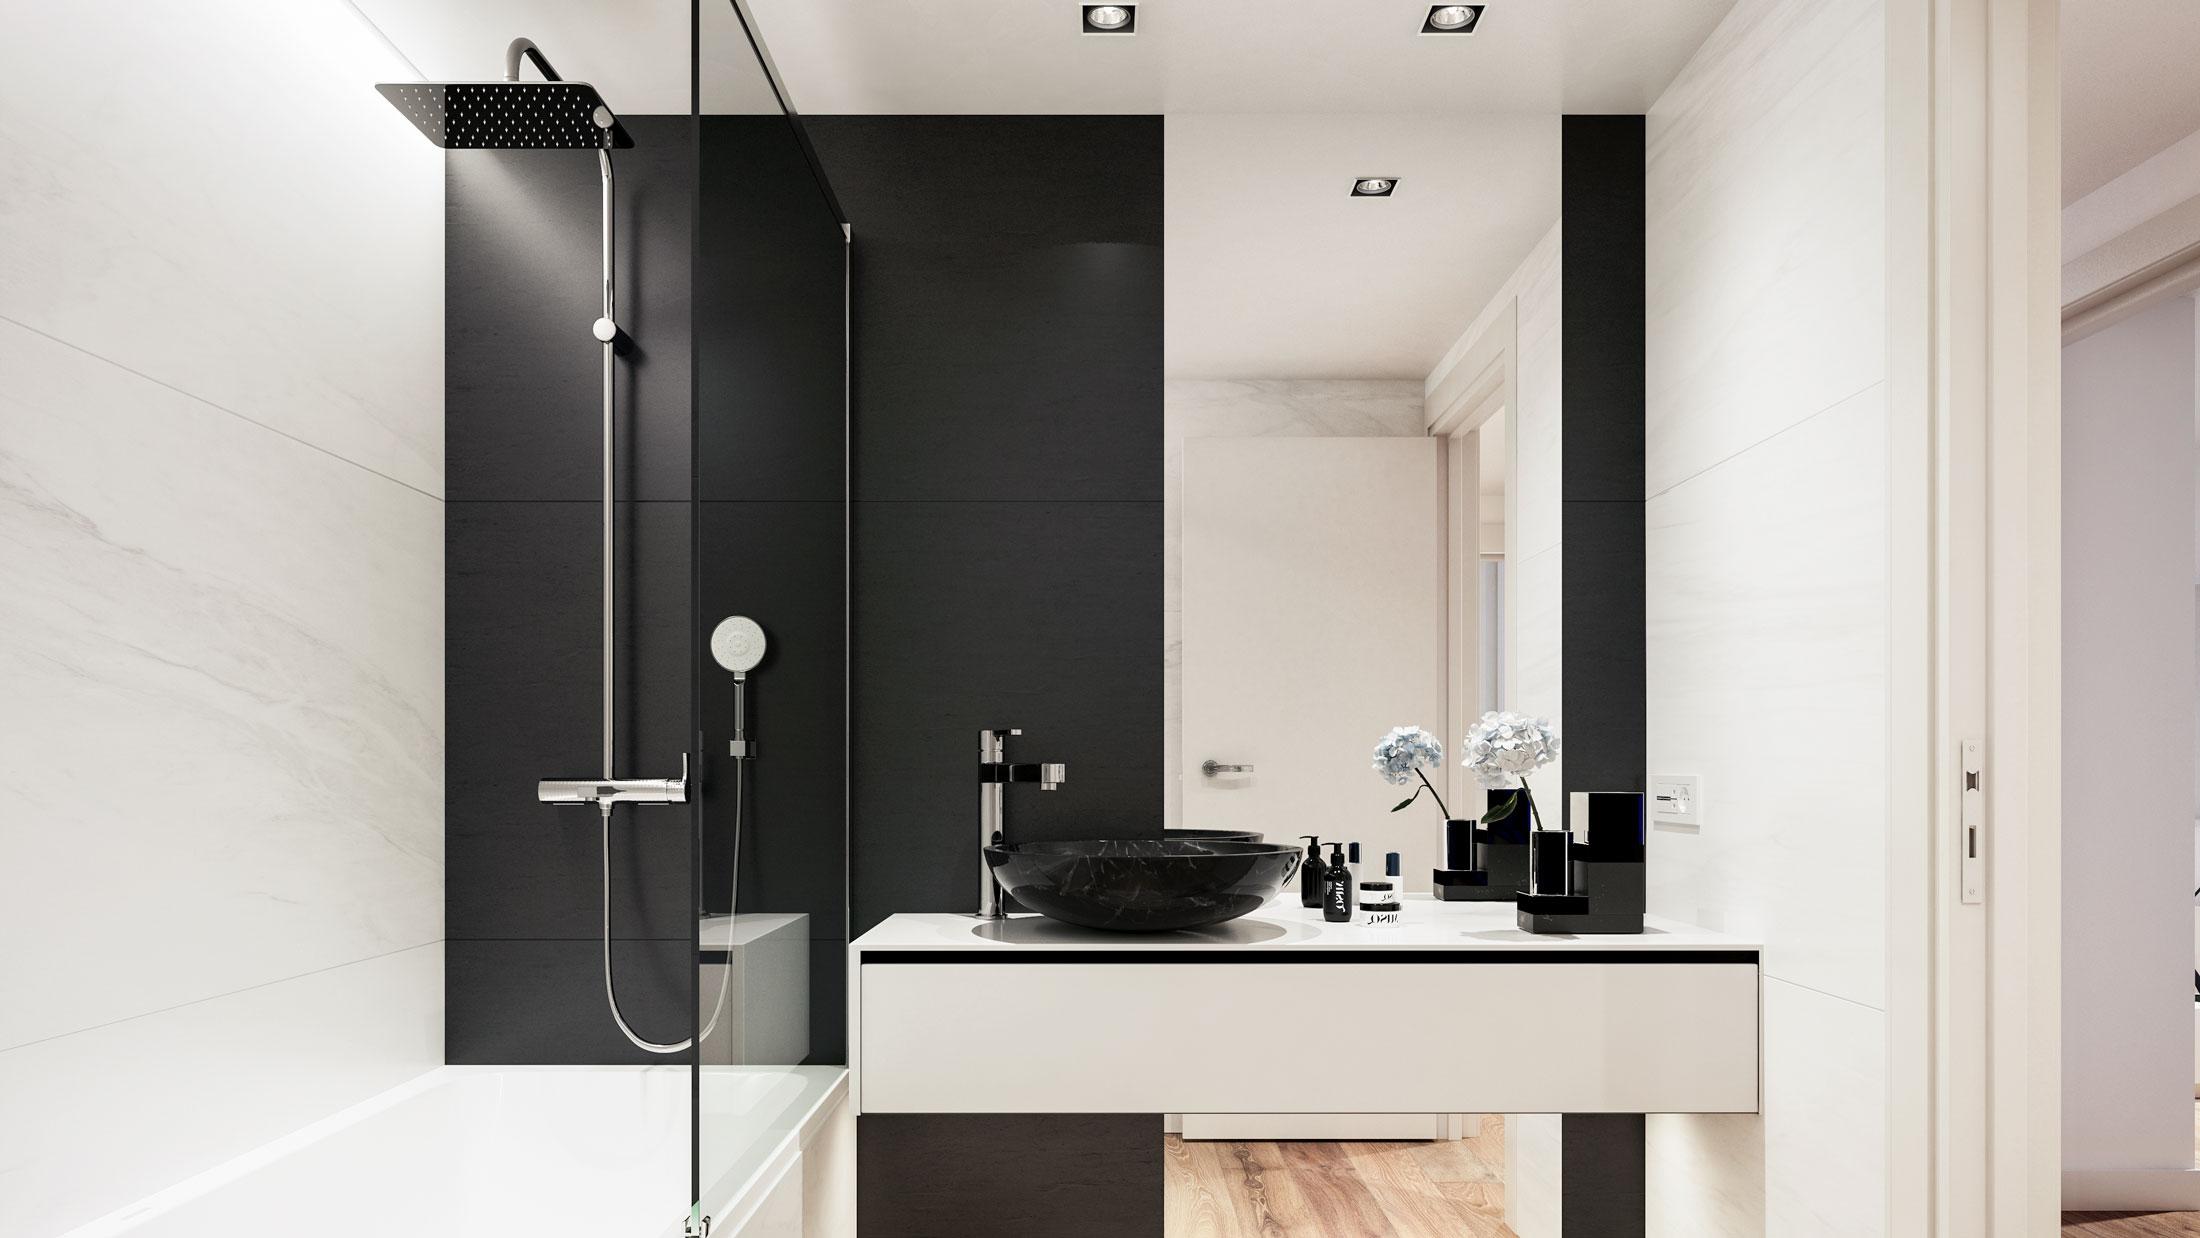 Residence second bathroom with bathtub.